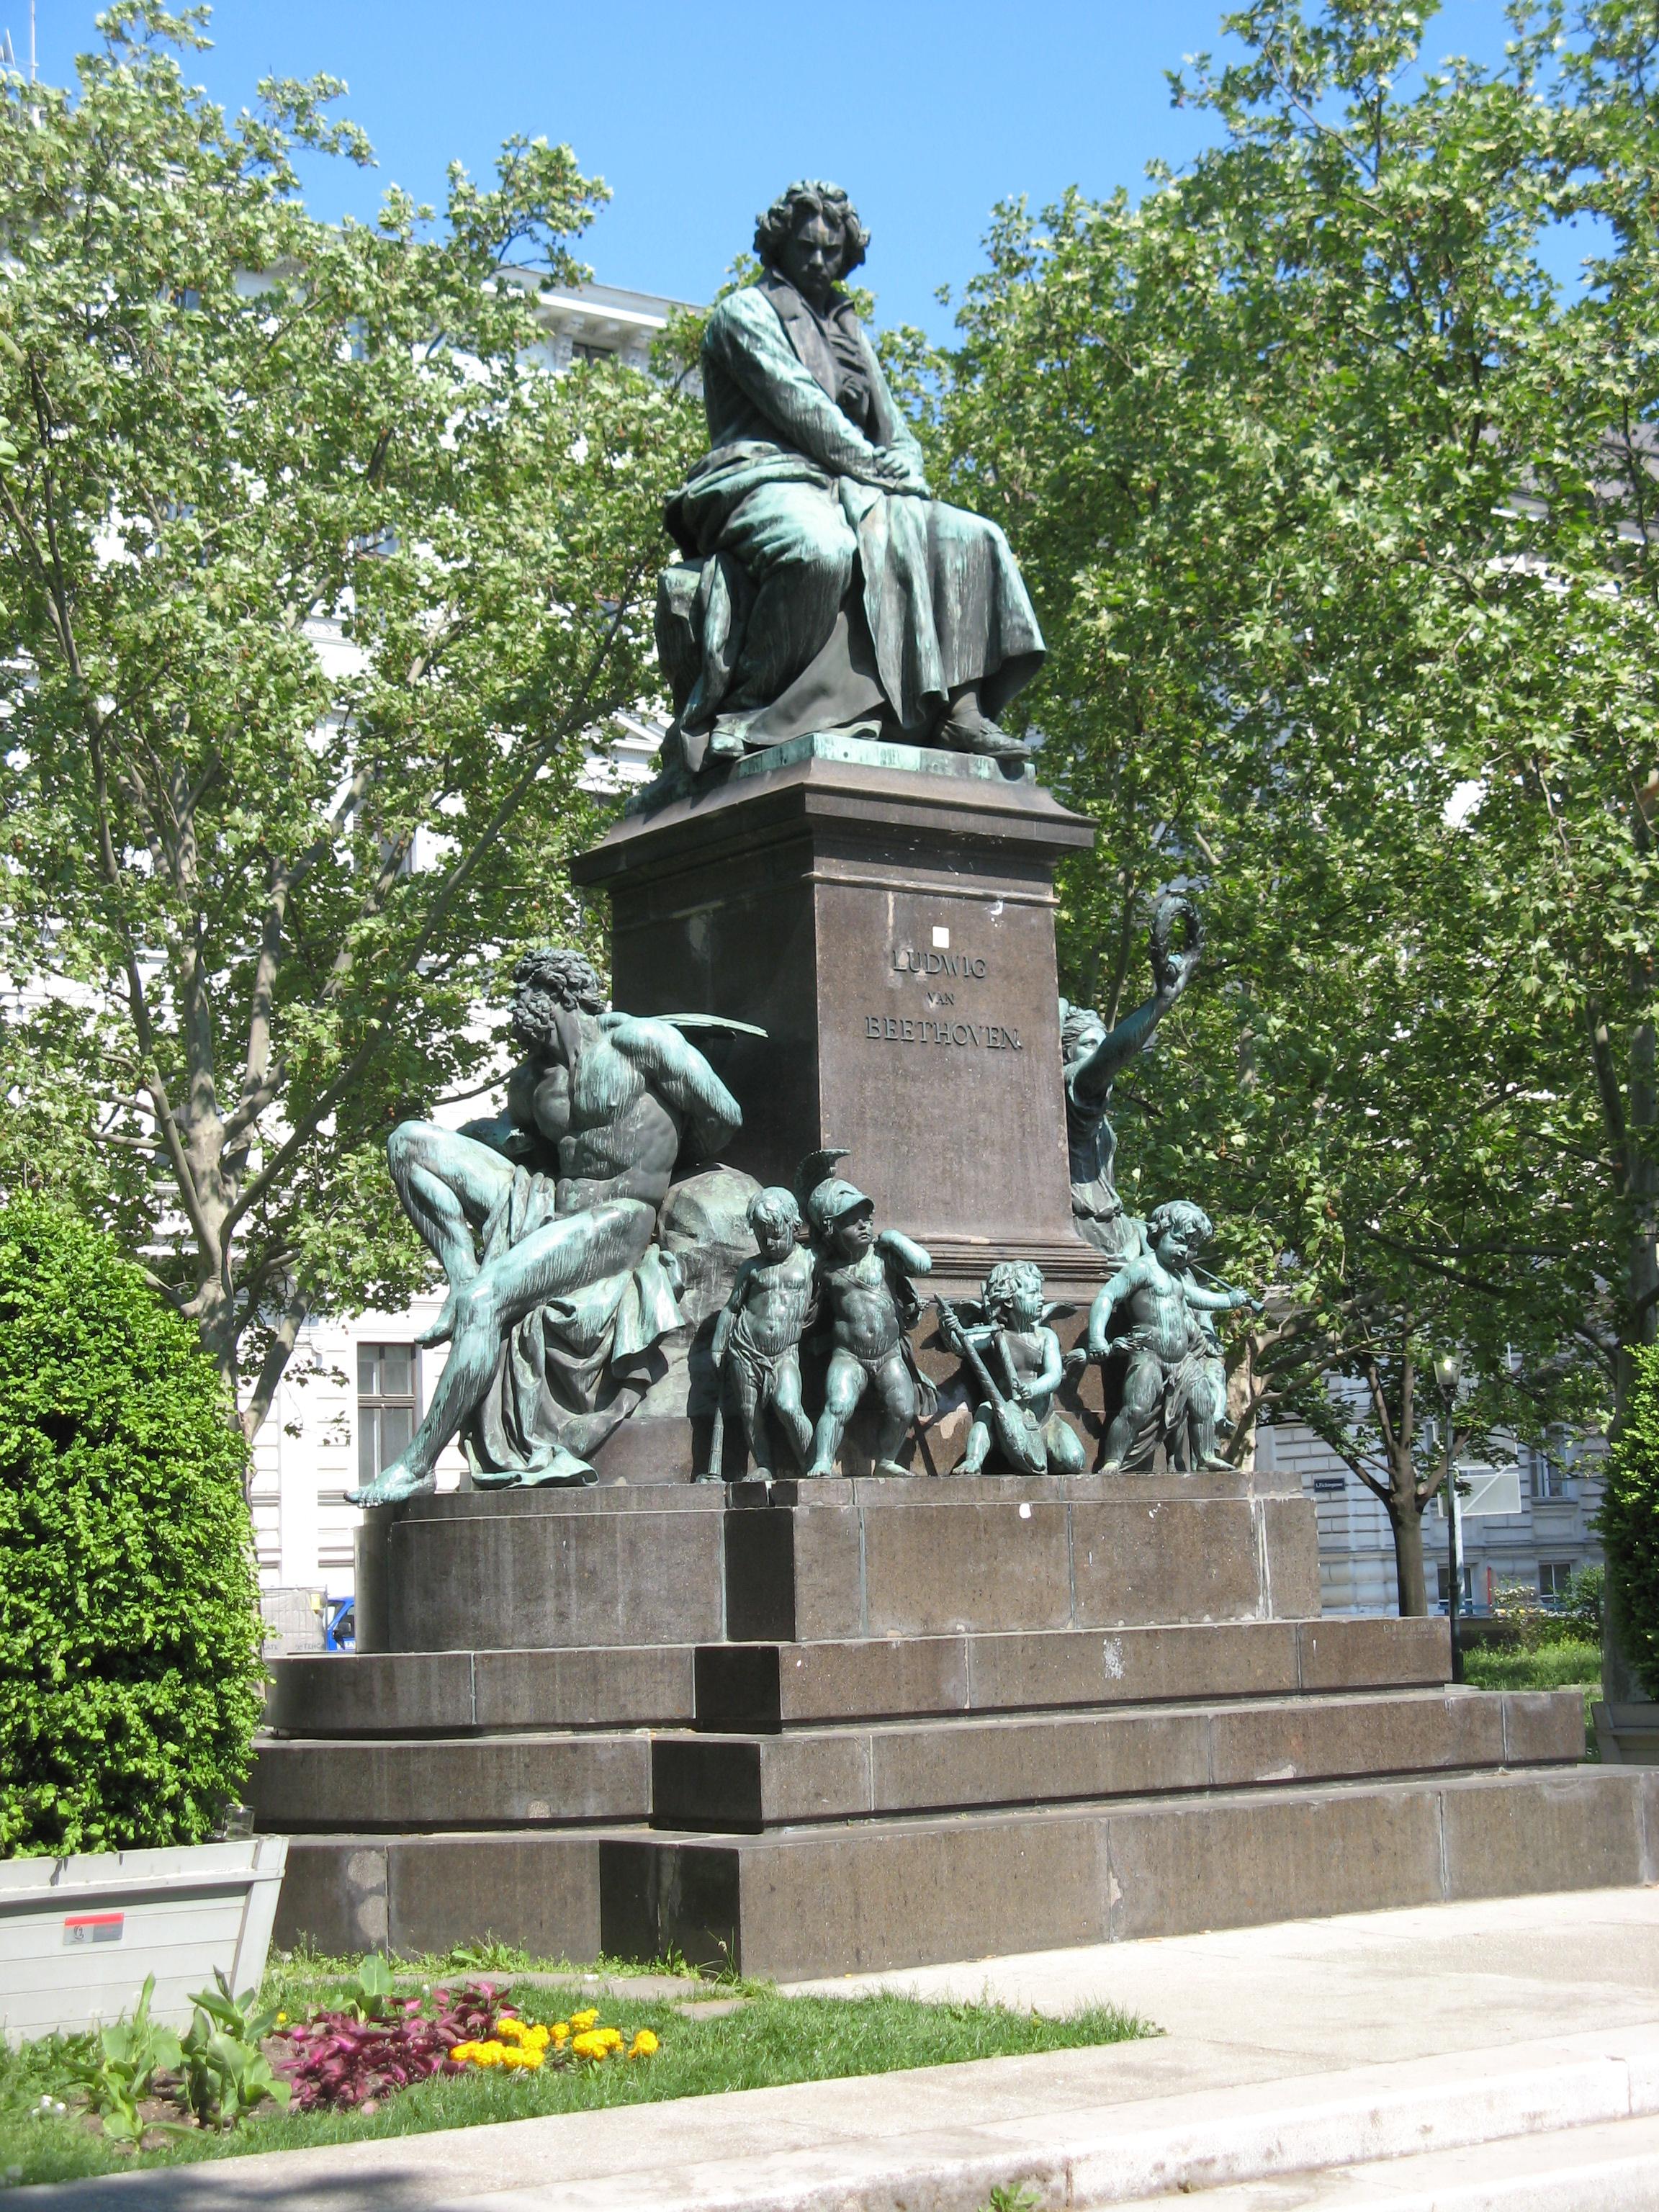 Ludwig van Beethoven ‧ Amadeus-Quartett Amadeus Quartett Streichquartette ‧ String Quartets ‧ Quatuors A Cordes Op. 127‧130‧131‧132‧133‧135